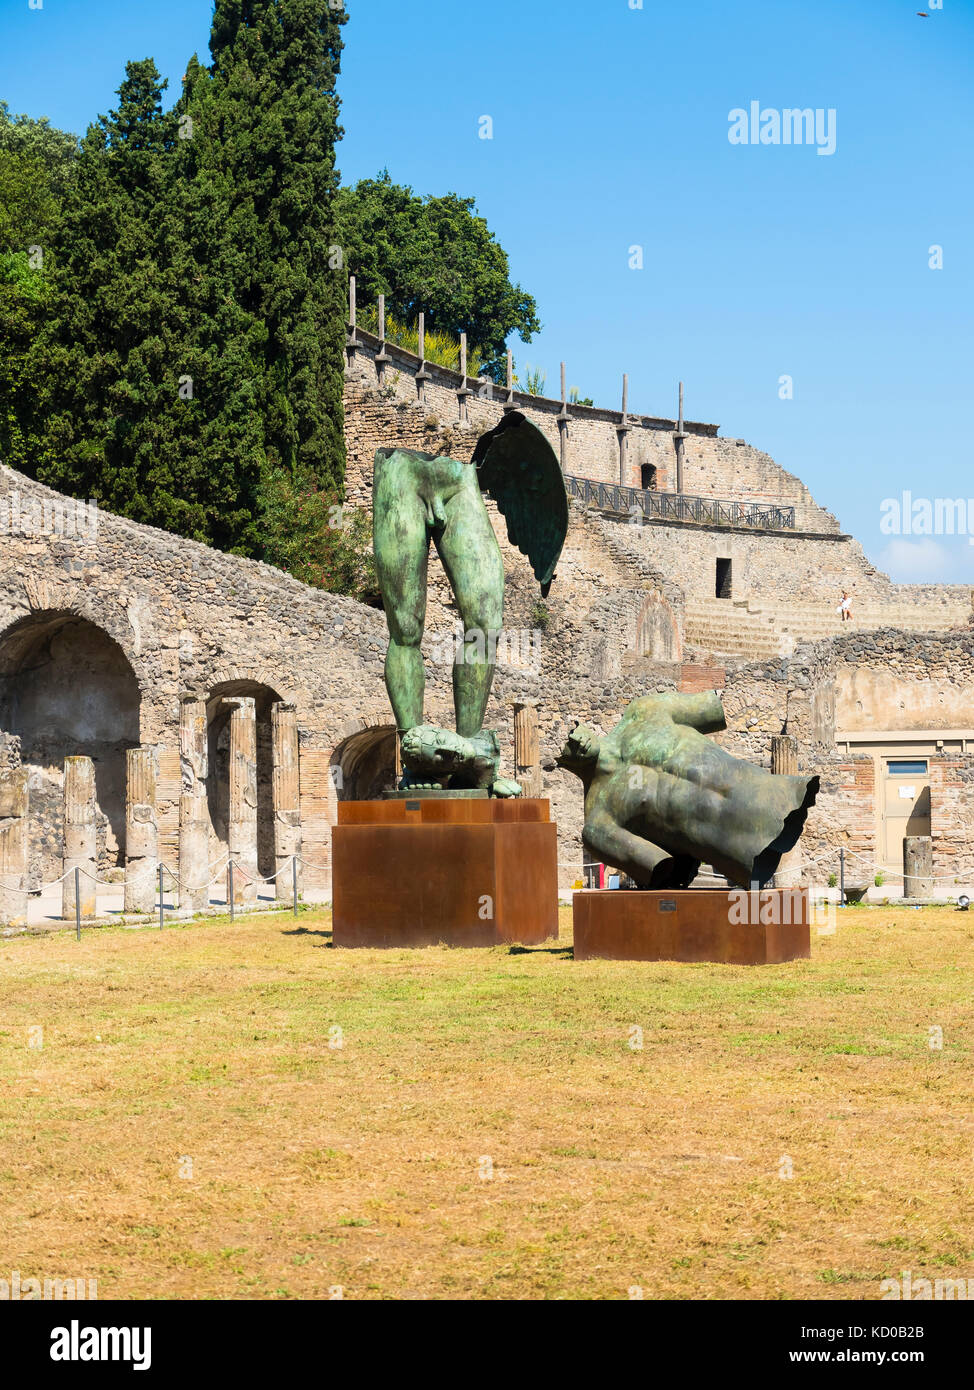 Temple ruins of Pompeii, Naples, Campania, Italy - Stock Image